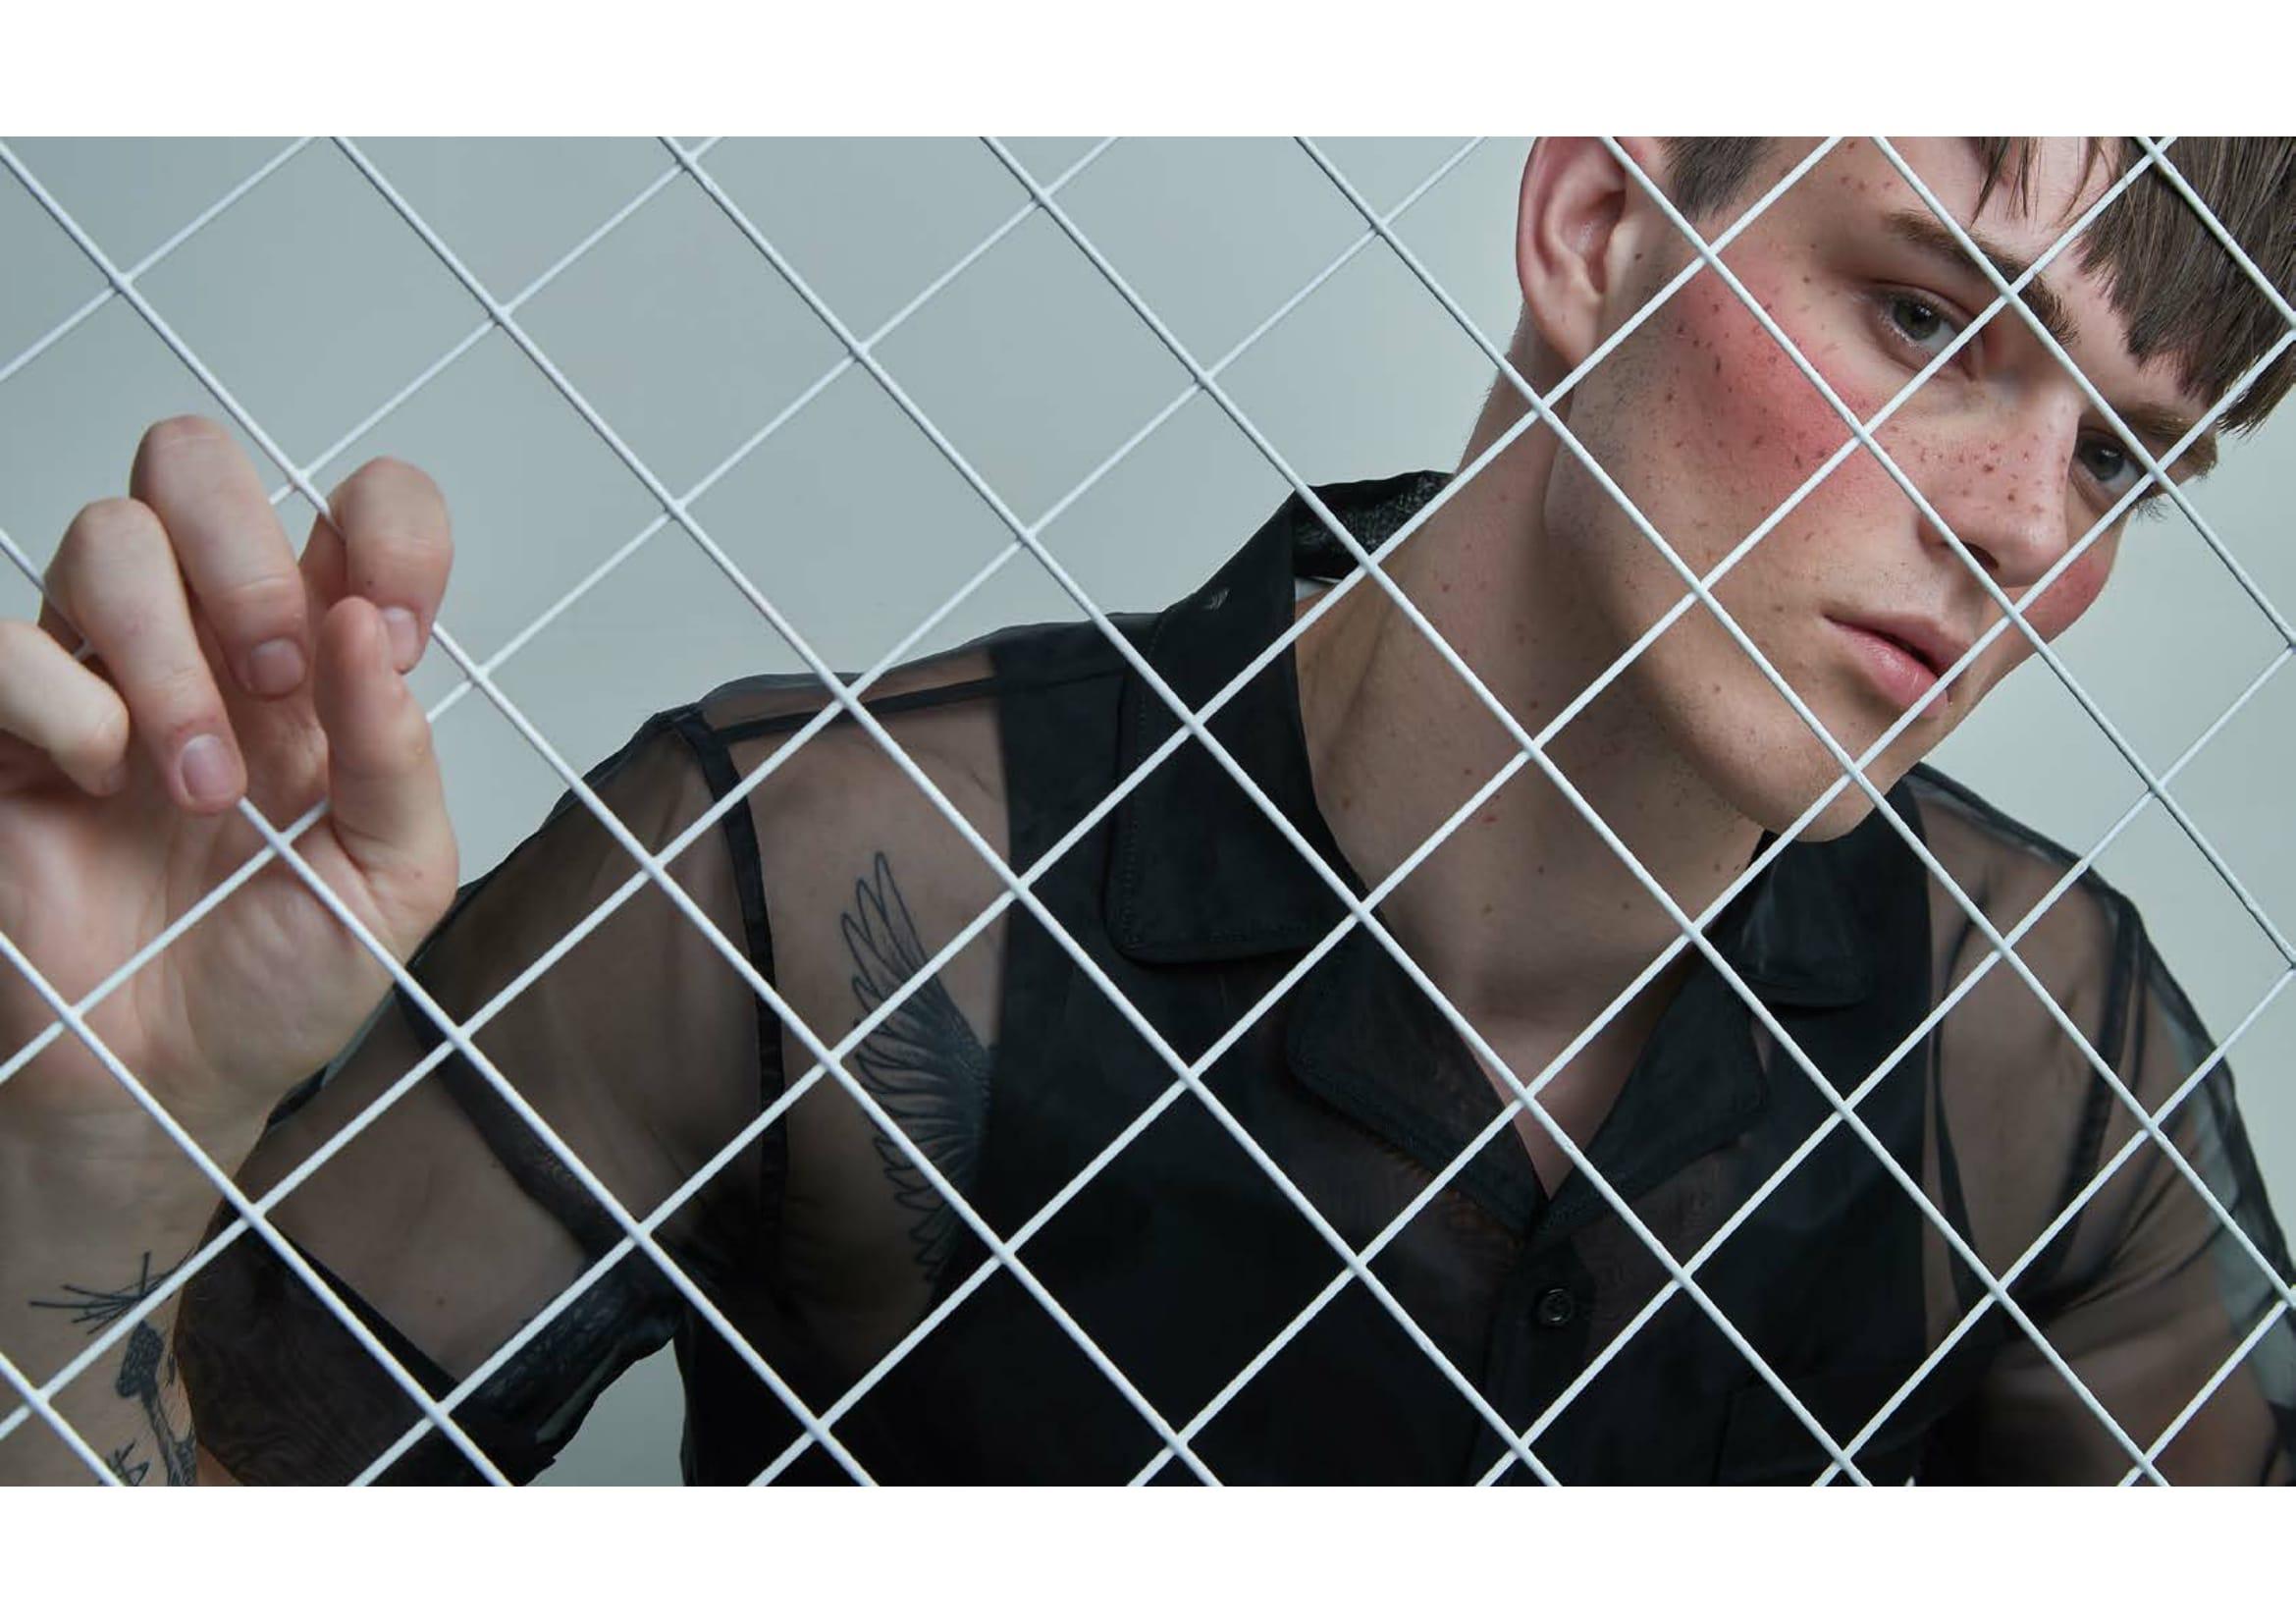 Andres Koma S/S 2017 Andres Koma S/S 2017 Vanity Teen 虚荣青年 Lifestyle & new faces magazine